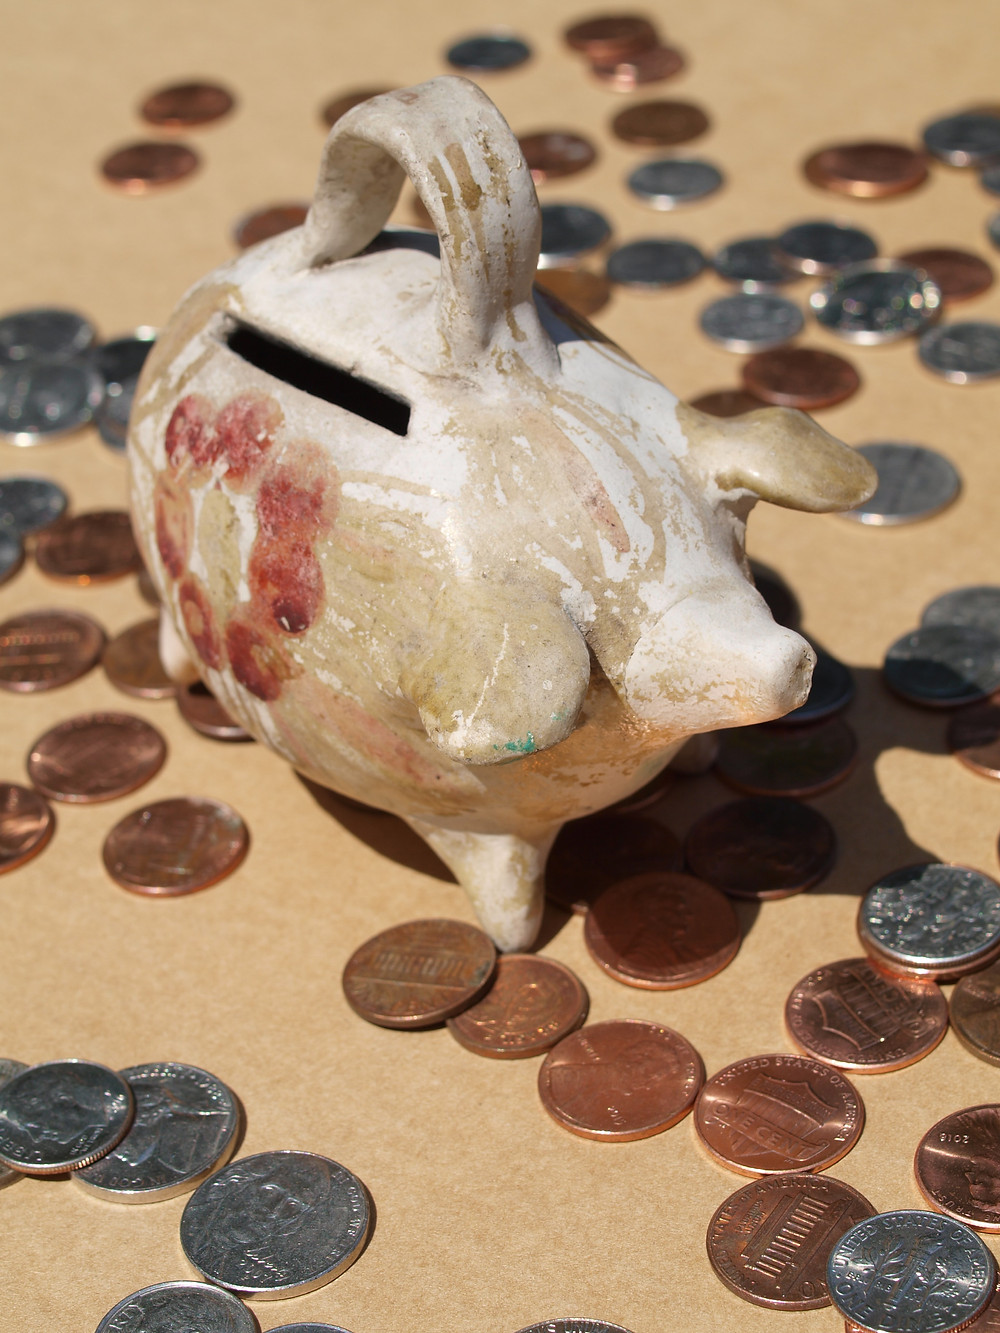 Piggy bank photo - saving money every month